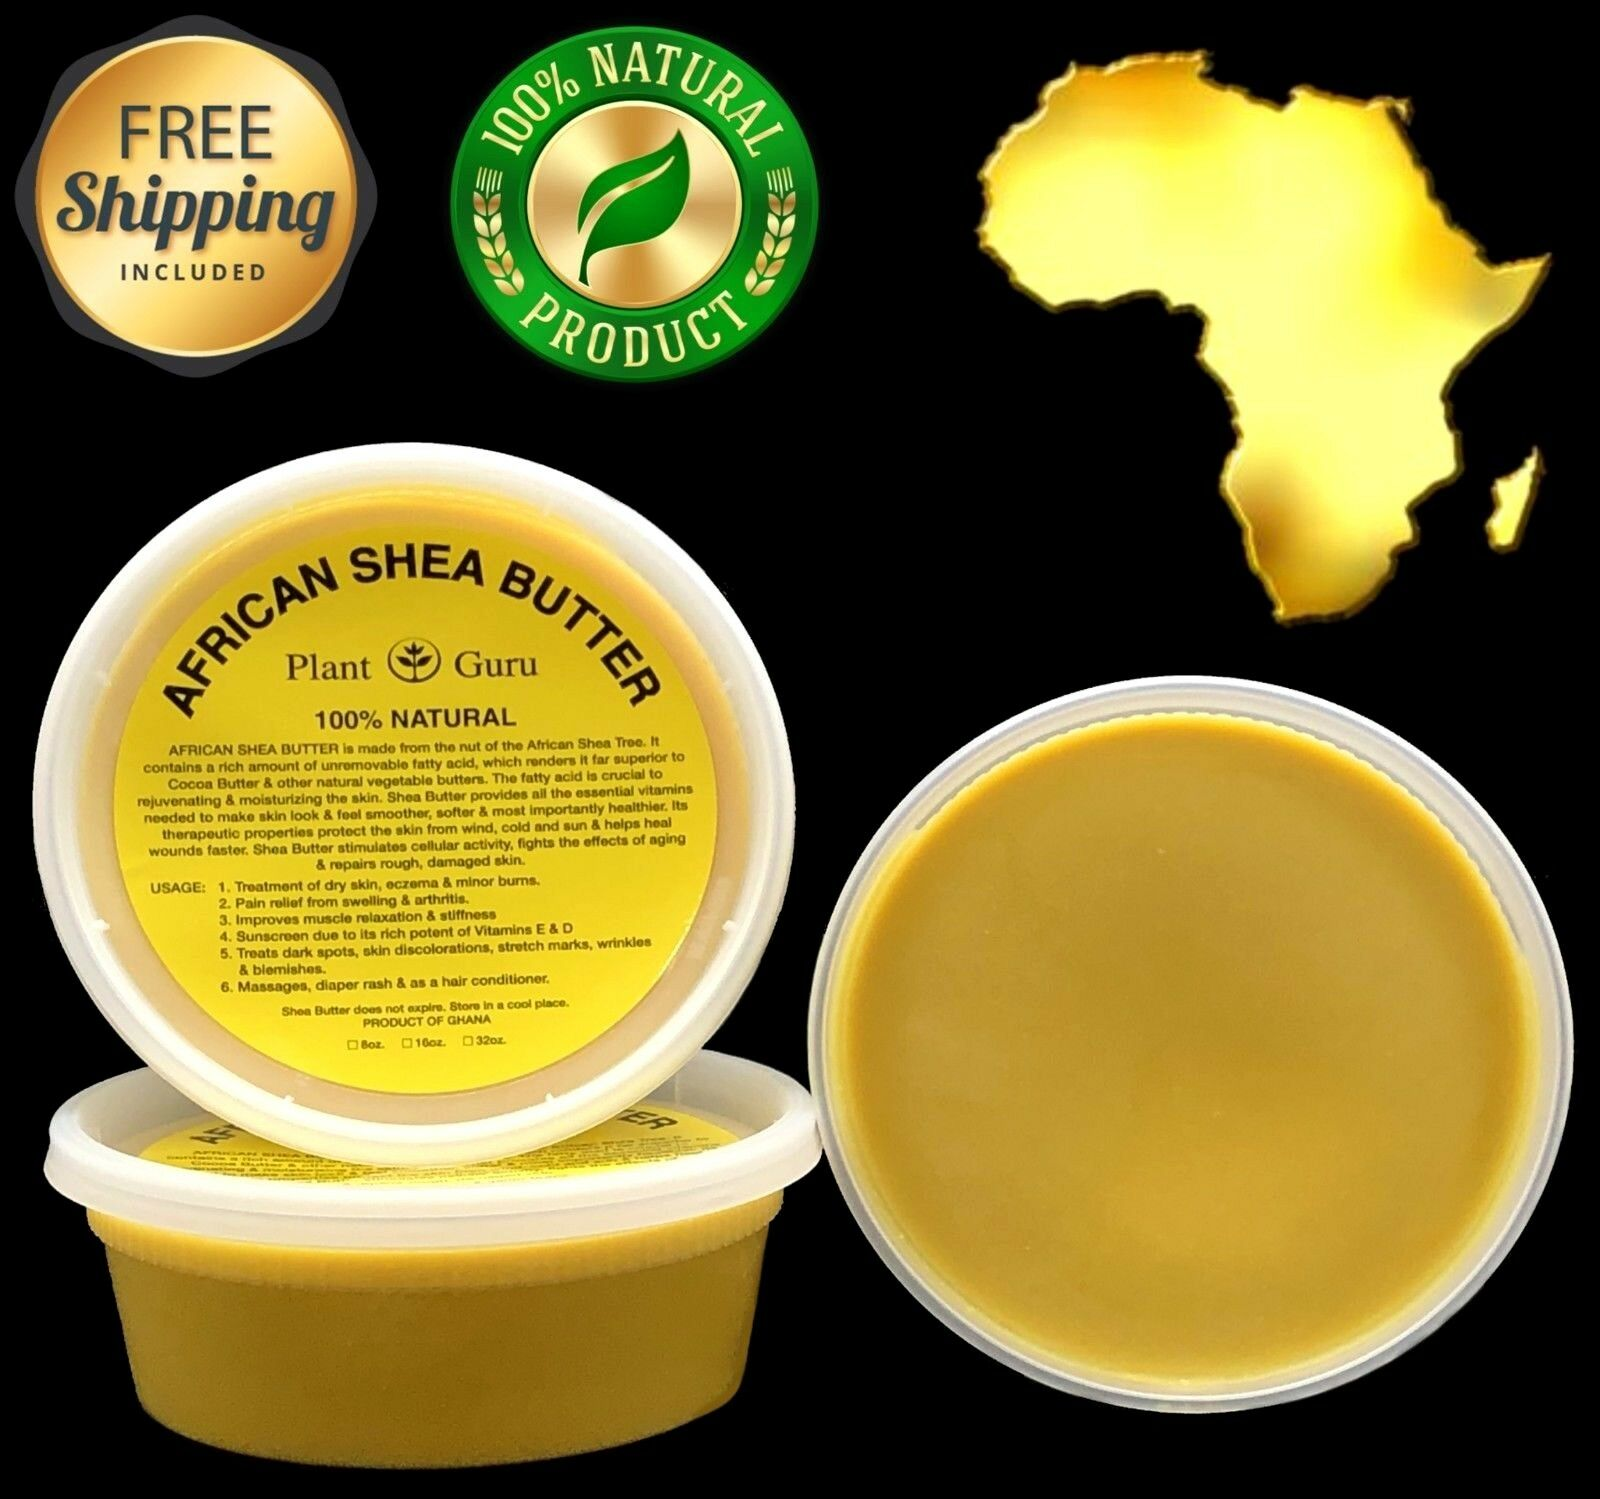 Raw African Shea Butter YELLOW 8 oz Unrefined Pure Organic 1